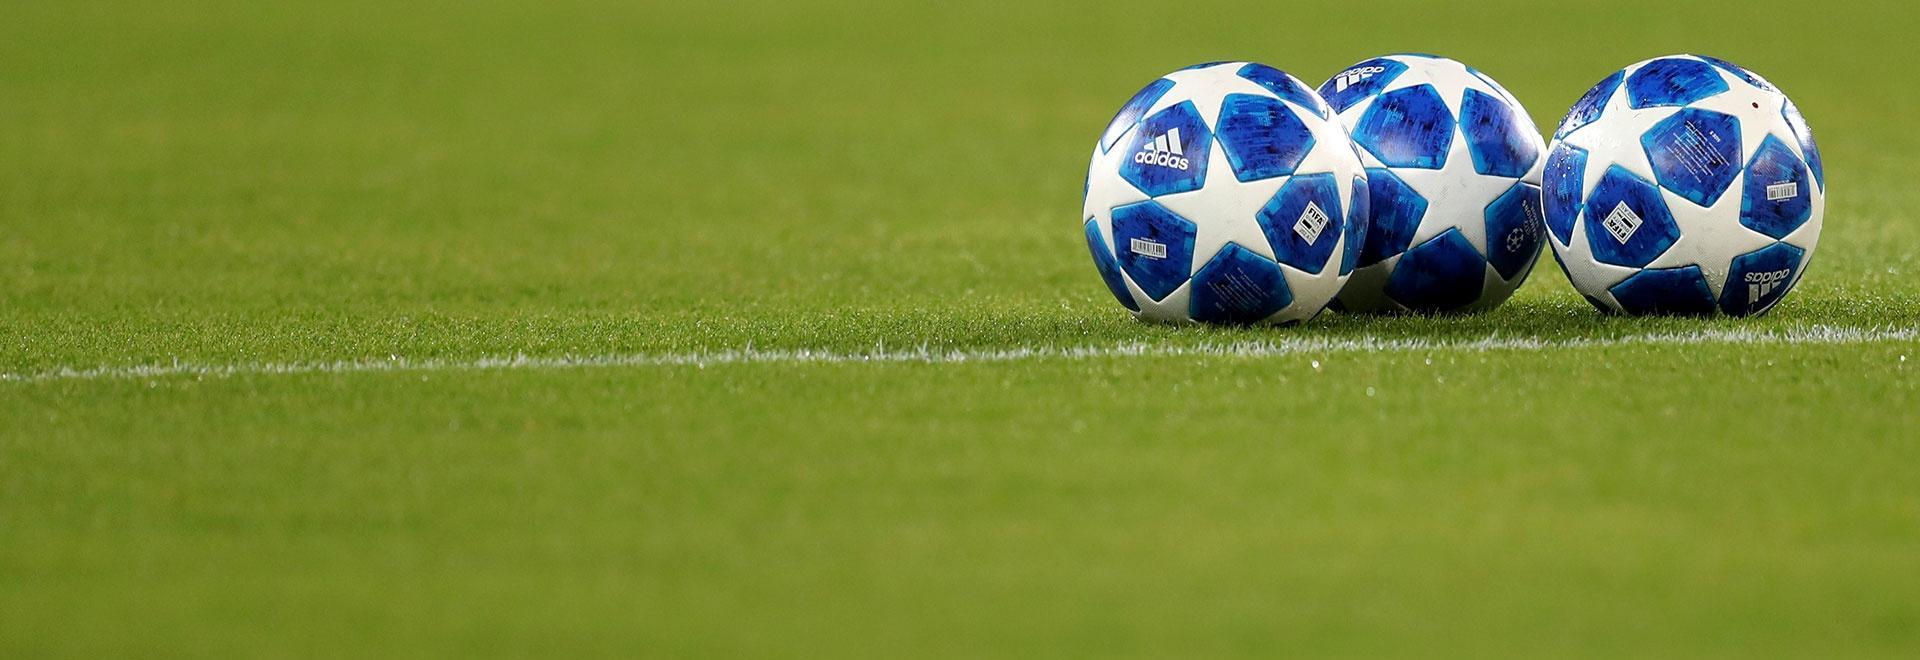 Real Madrid - Atletico M. 2014